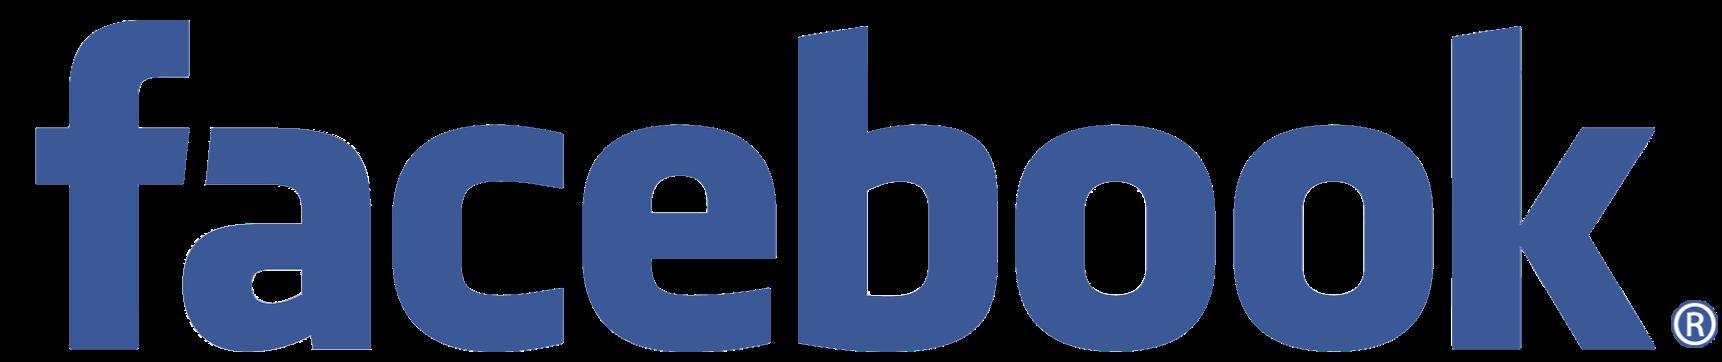 http://www.facebook.com/ElecToolShop/